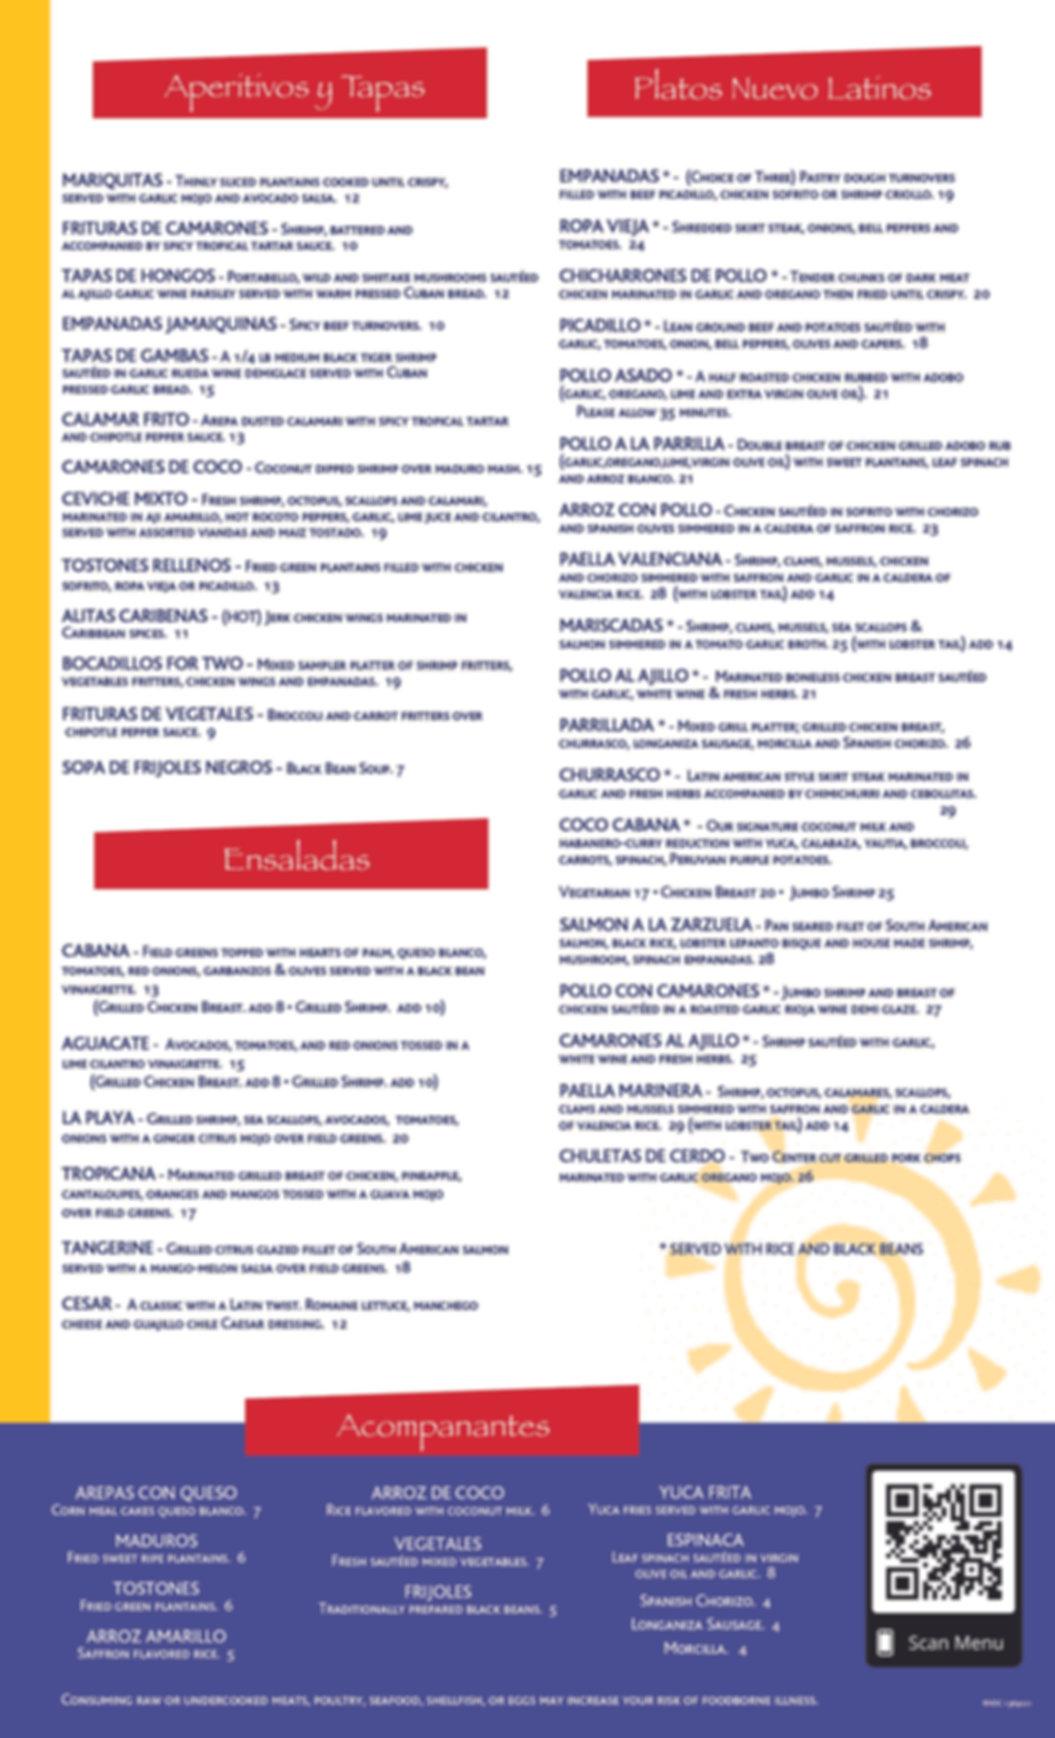 menu 2 delray .jpg